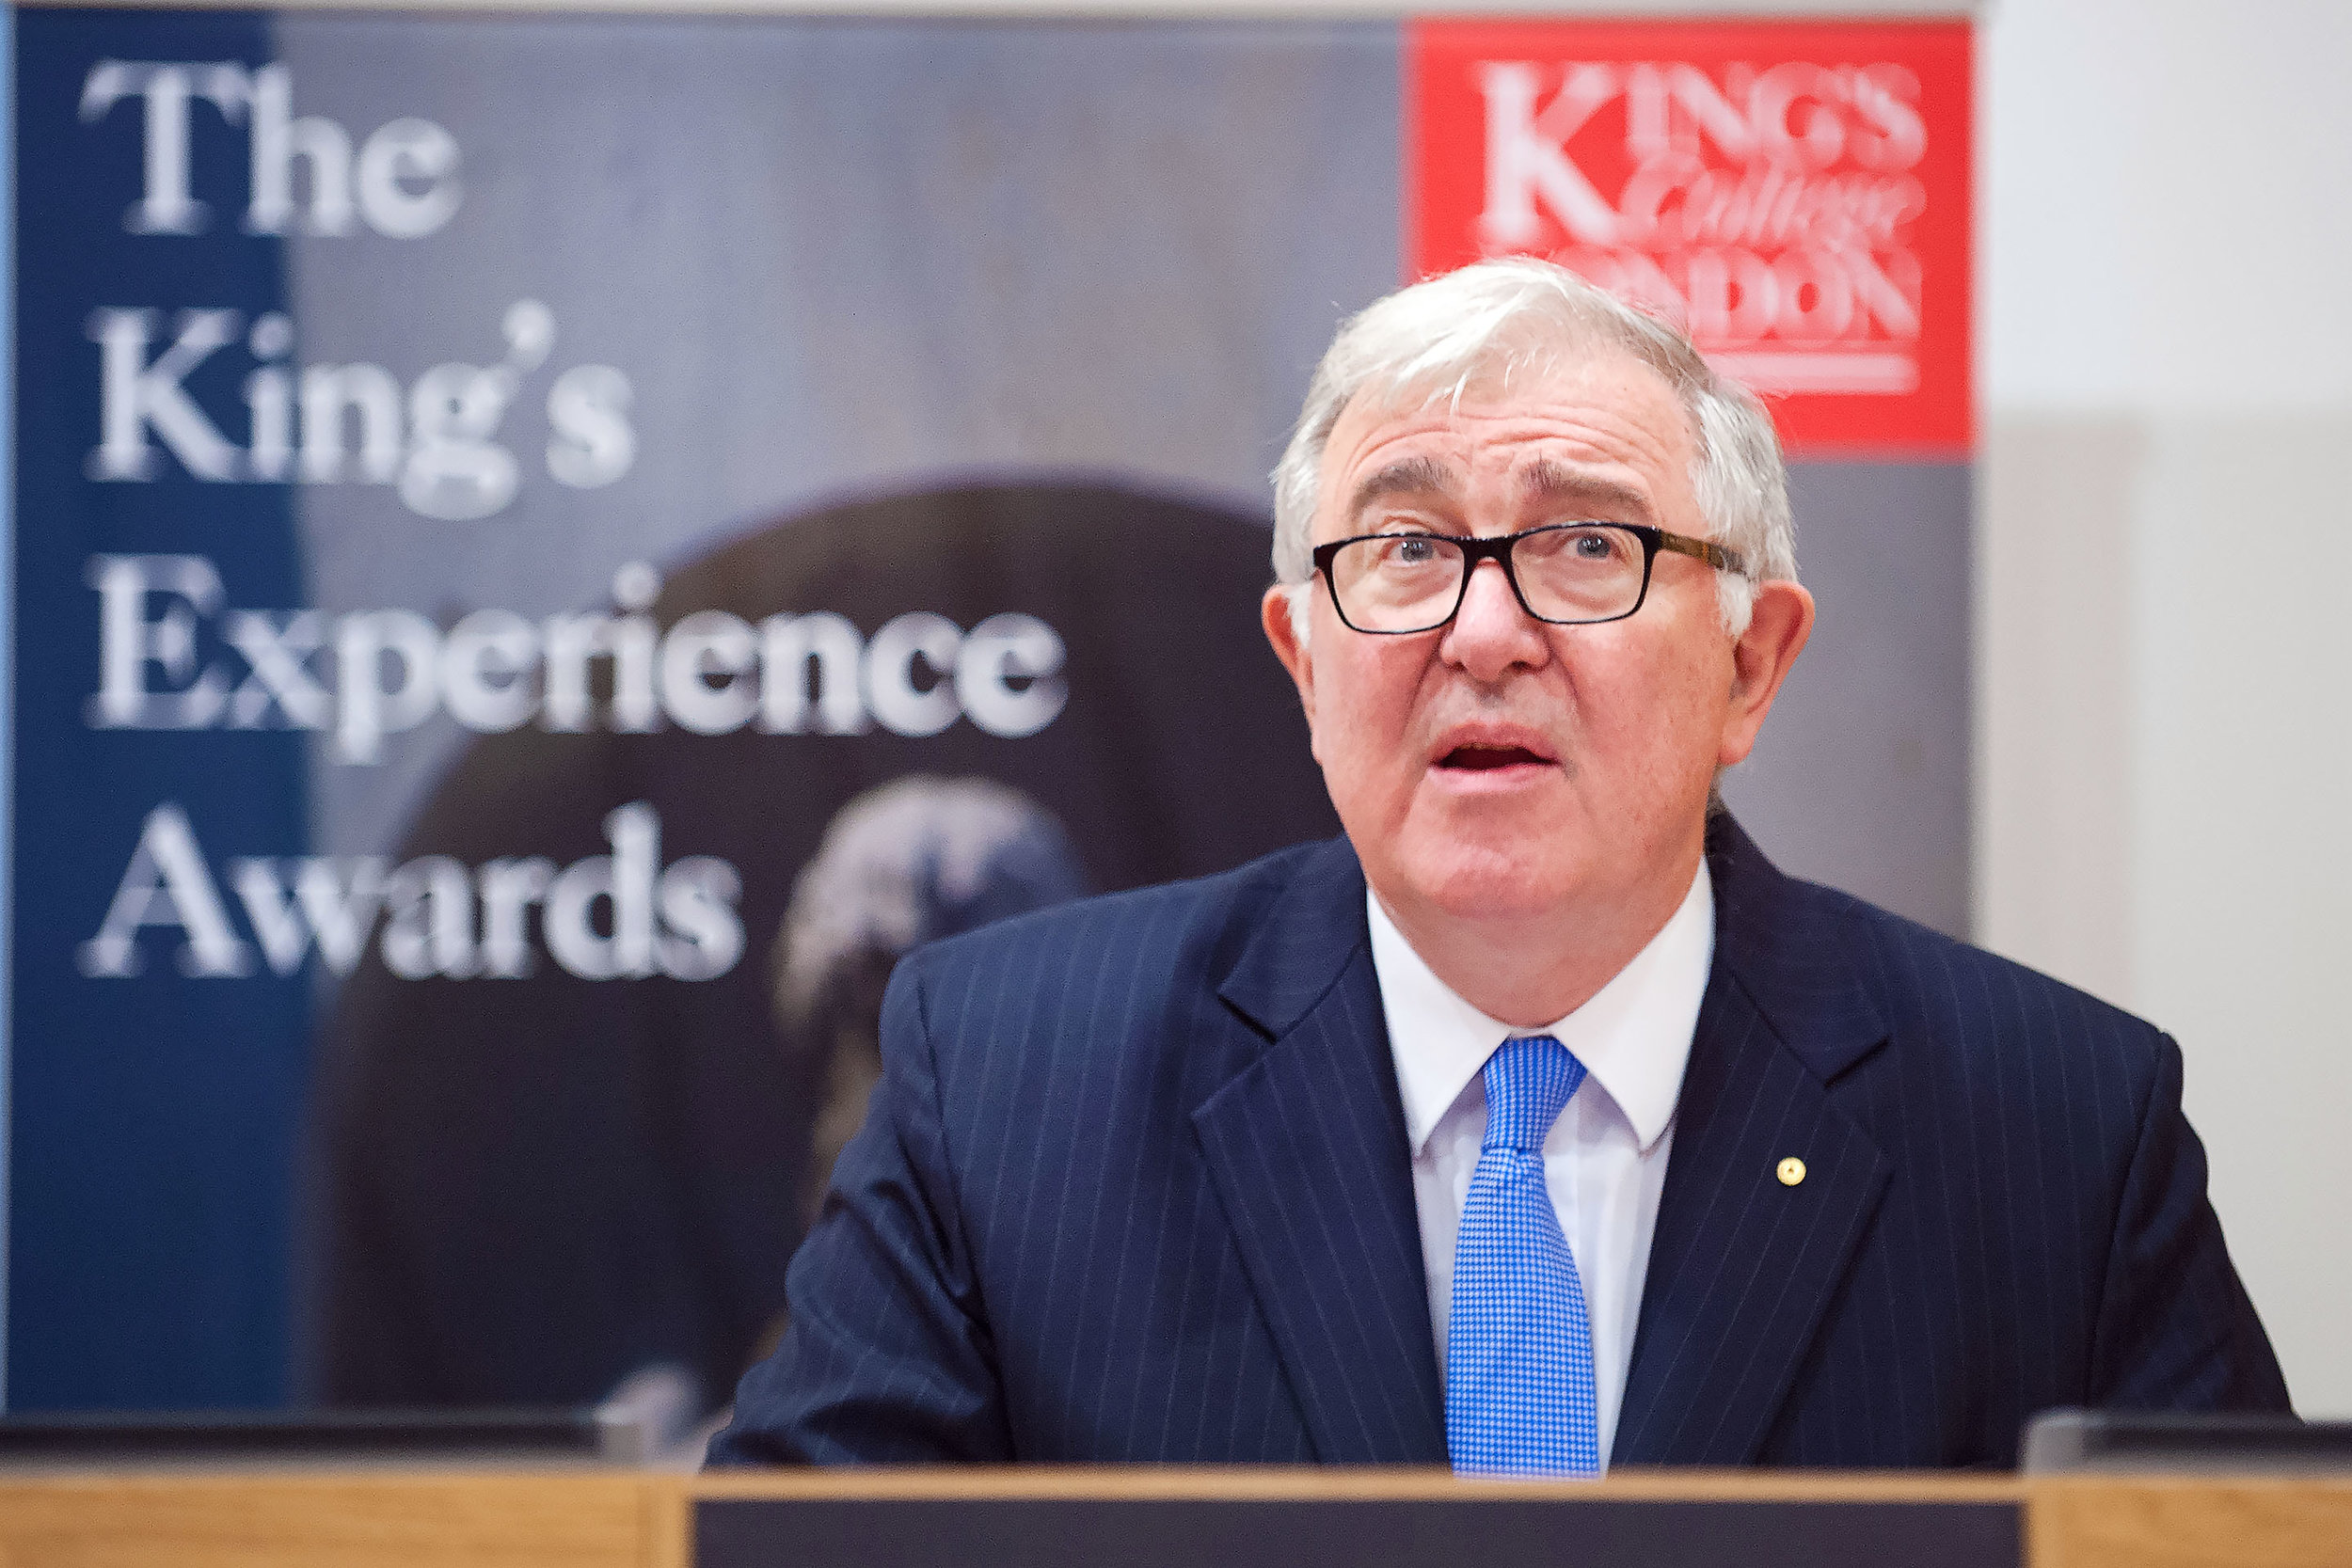 kings_experience_awards_071216_0100.jpg